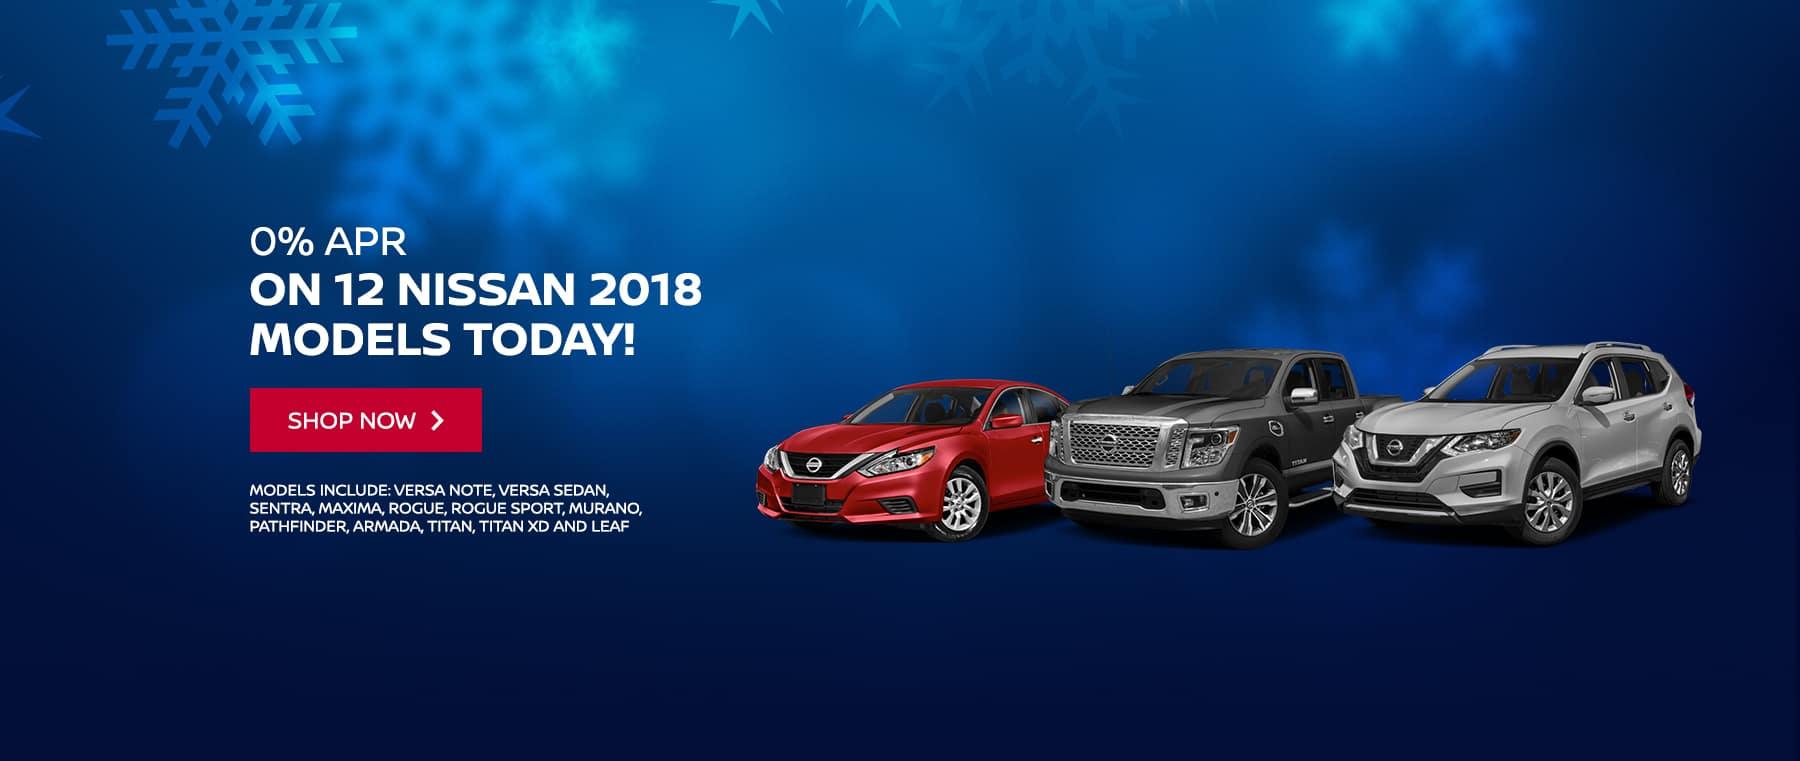 0% APR on 12 2018 Nissan Models